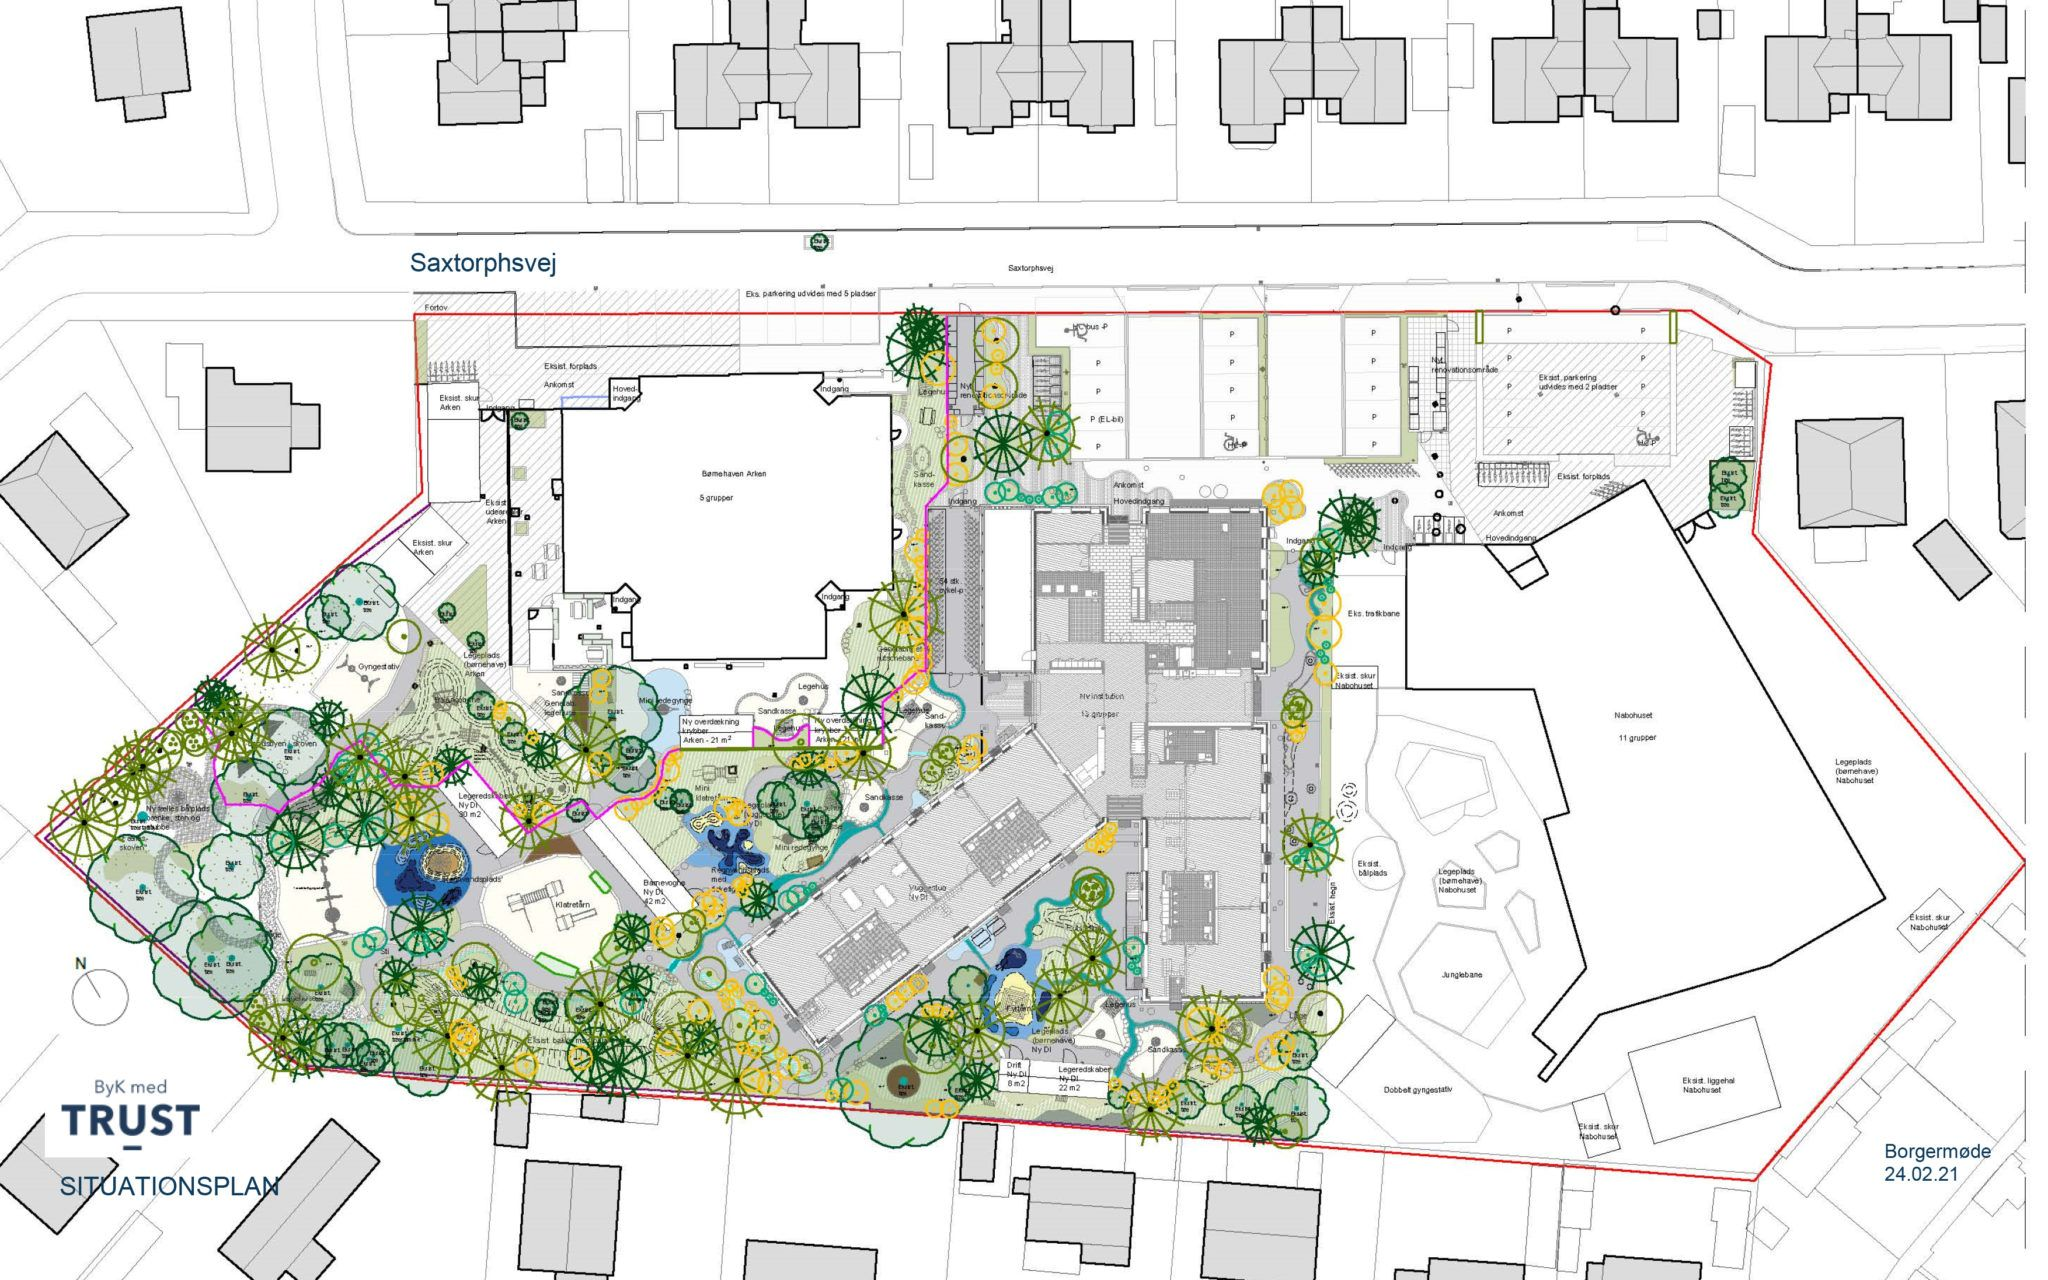 Situationsplan lokalplanforslag Saxtorphsvej II